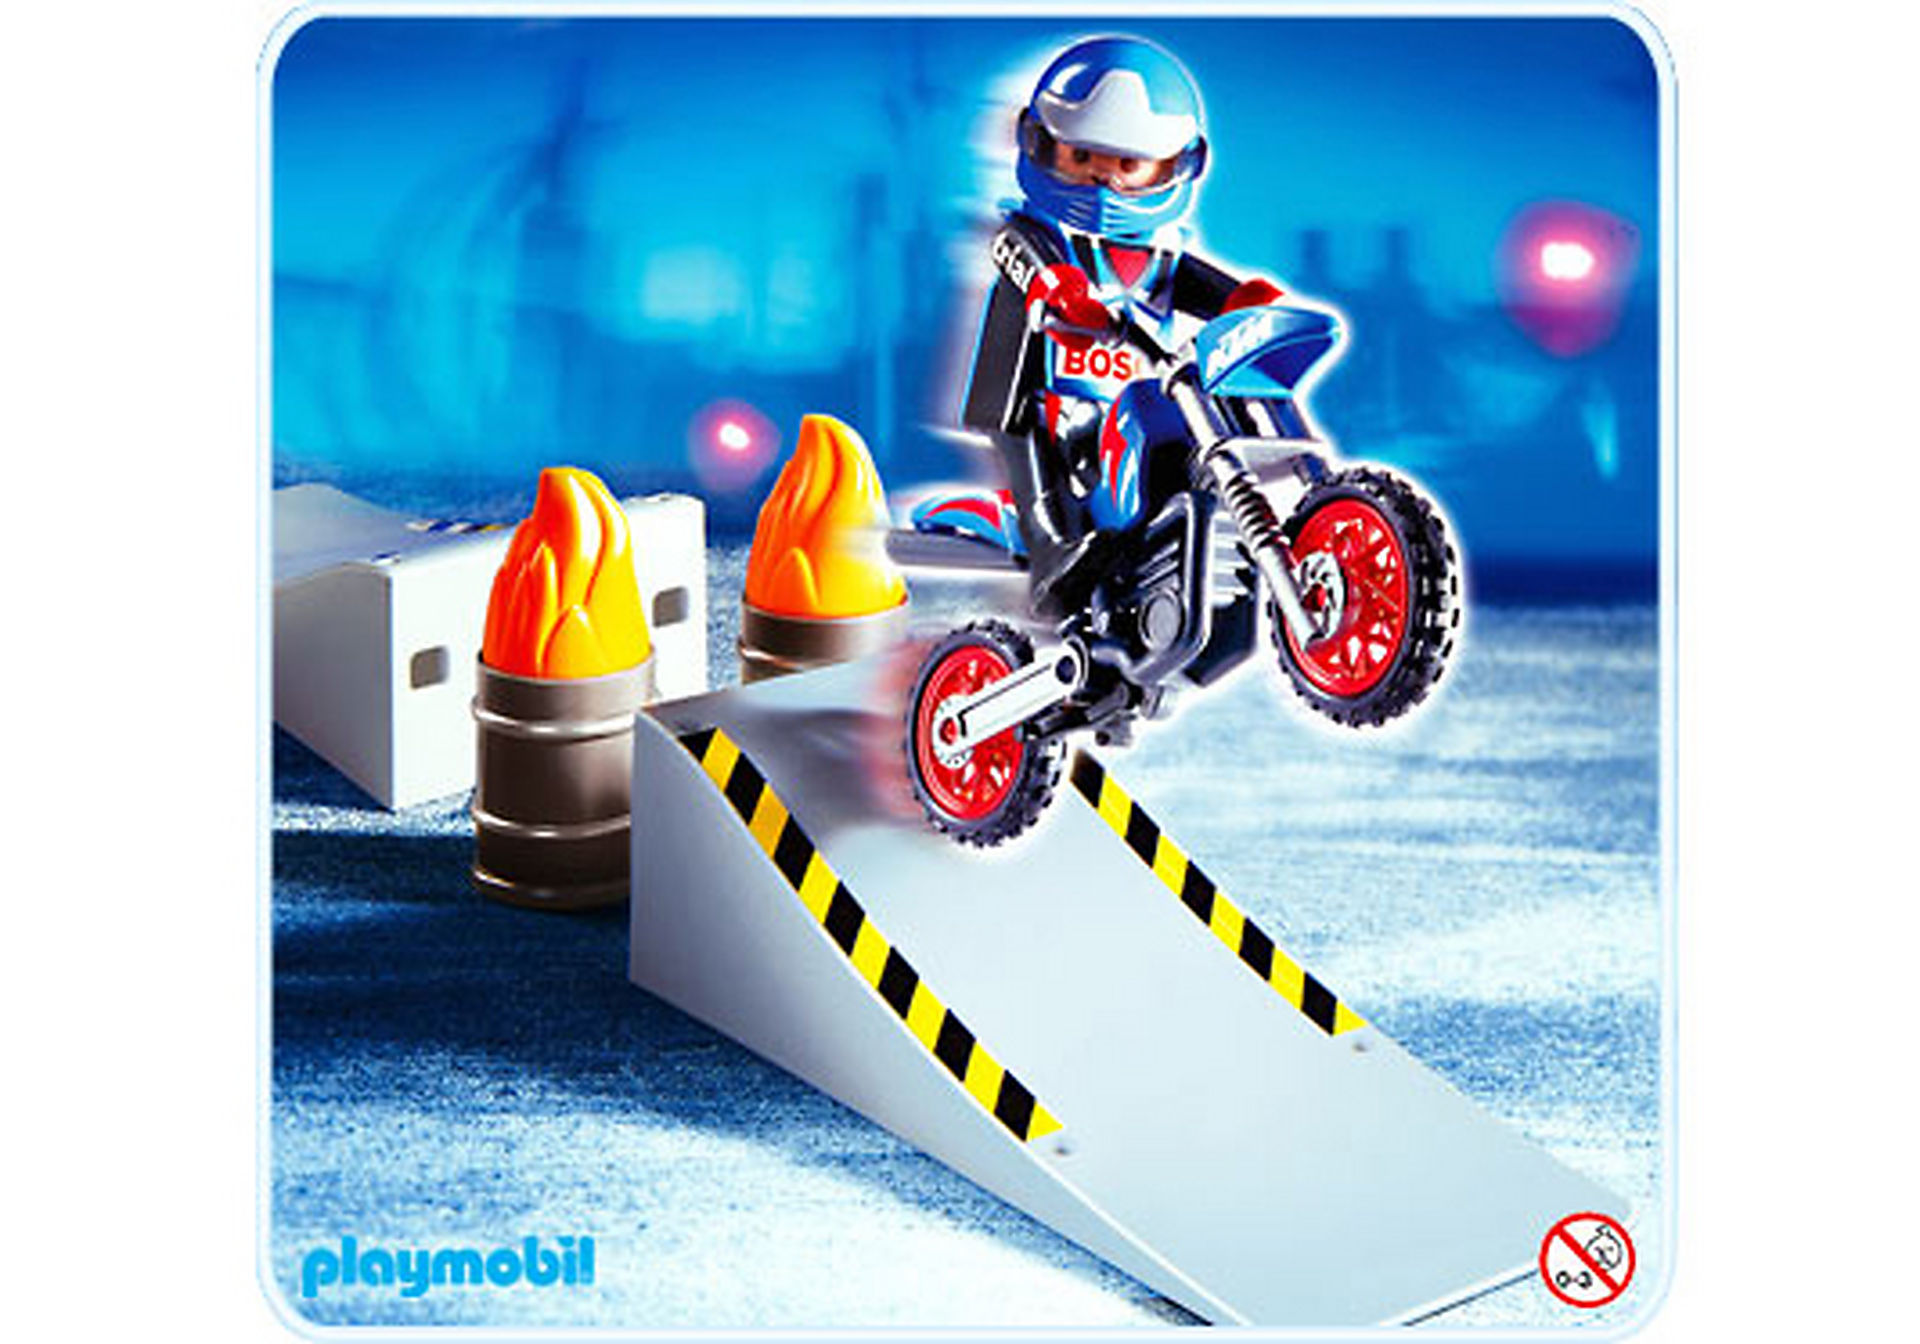 http://media.playmobil.com/i/playmobil/4416-A_product_detail/Motocross-Fahrer mit Rampe